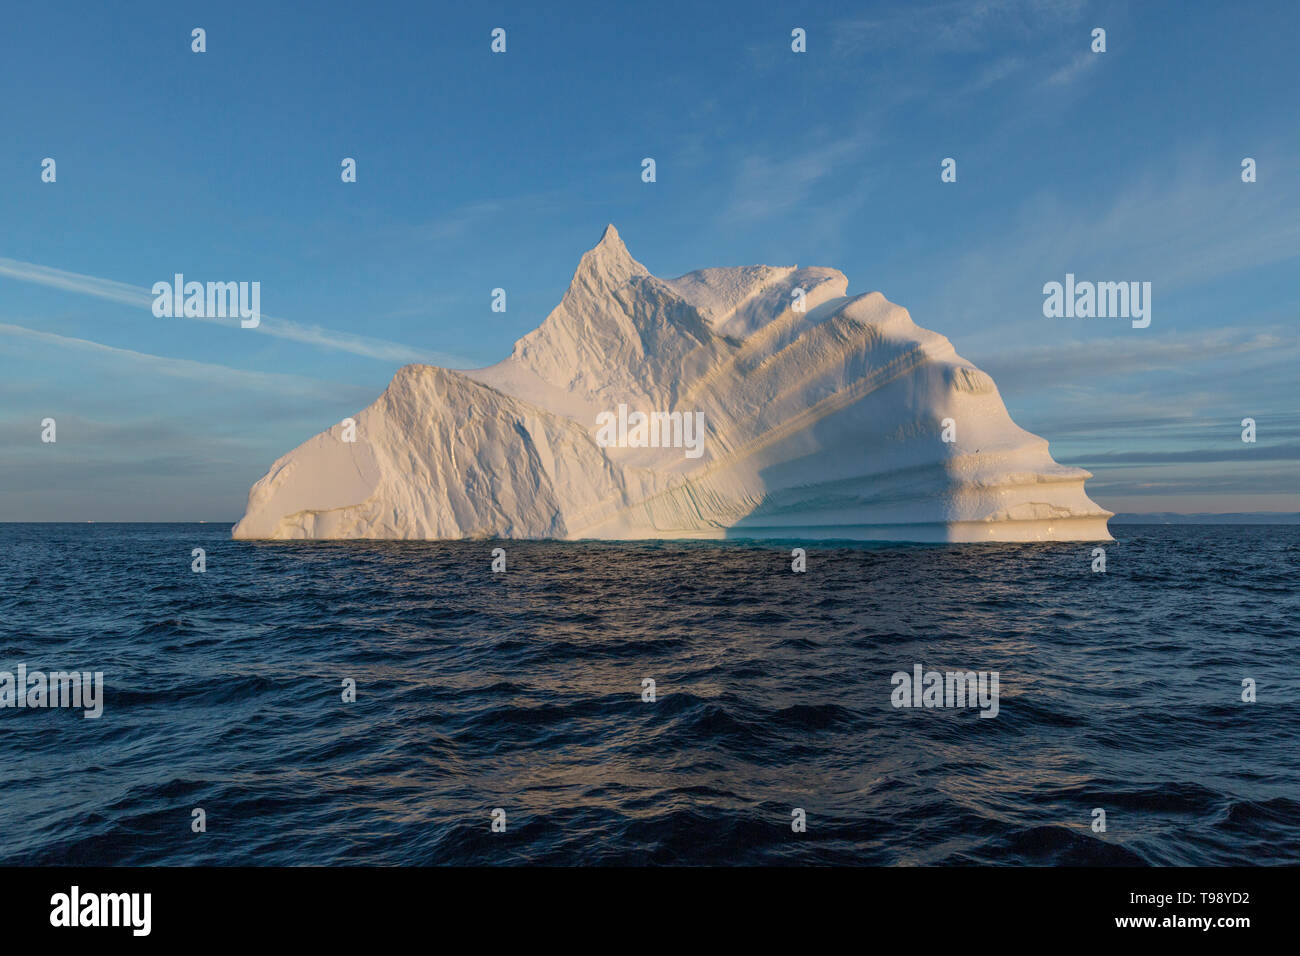 Icebergs in Disko Bay on Midsummer, Greenland Stock Photo